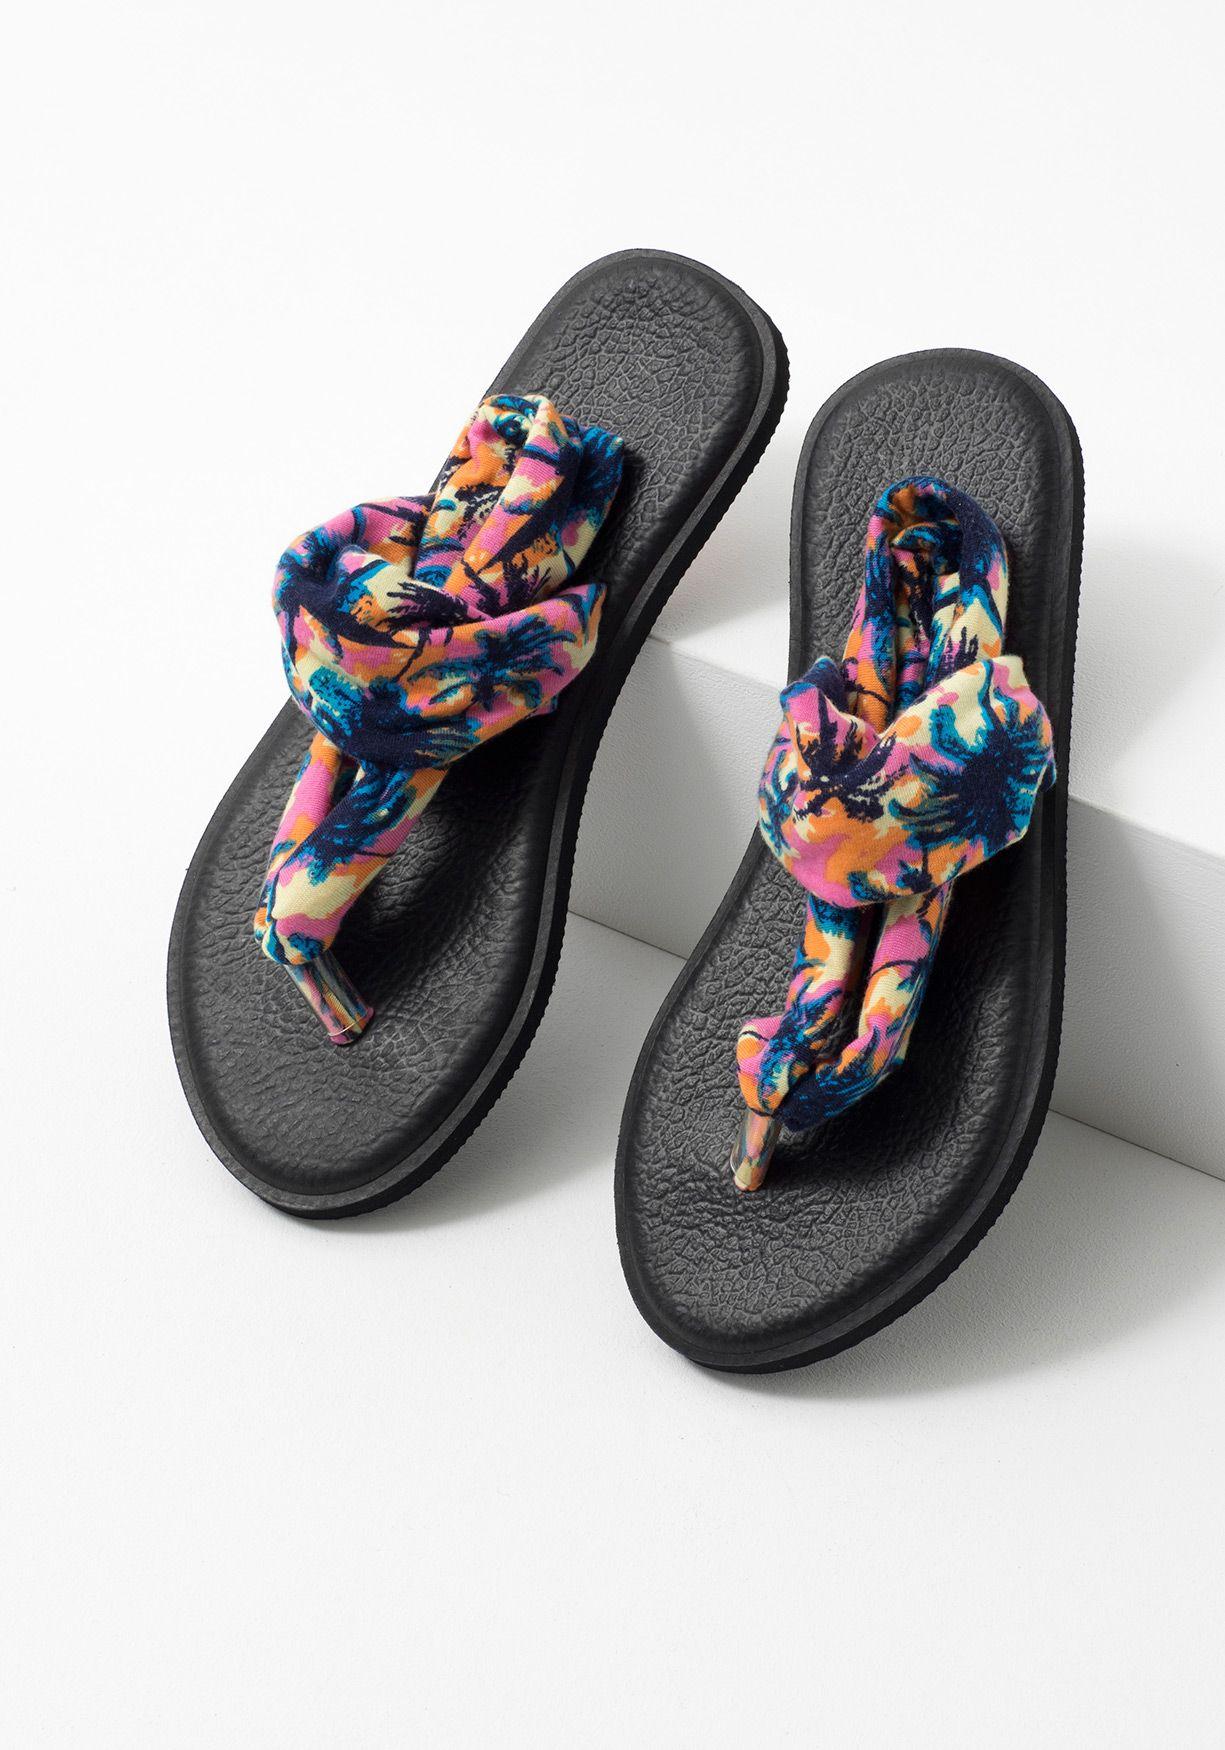 TexWish En Carrefour Ofertas De Tu Tienda Moda Ropa Online VUzpqSM